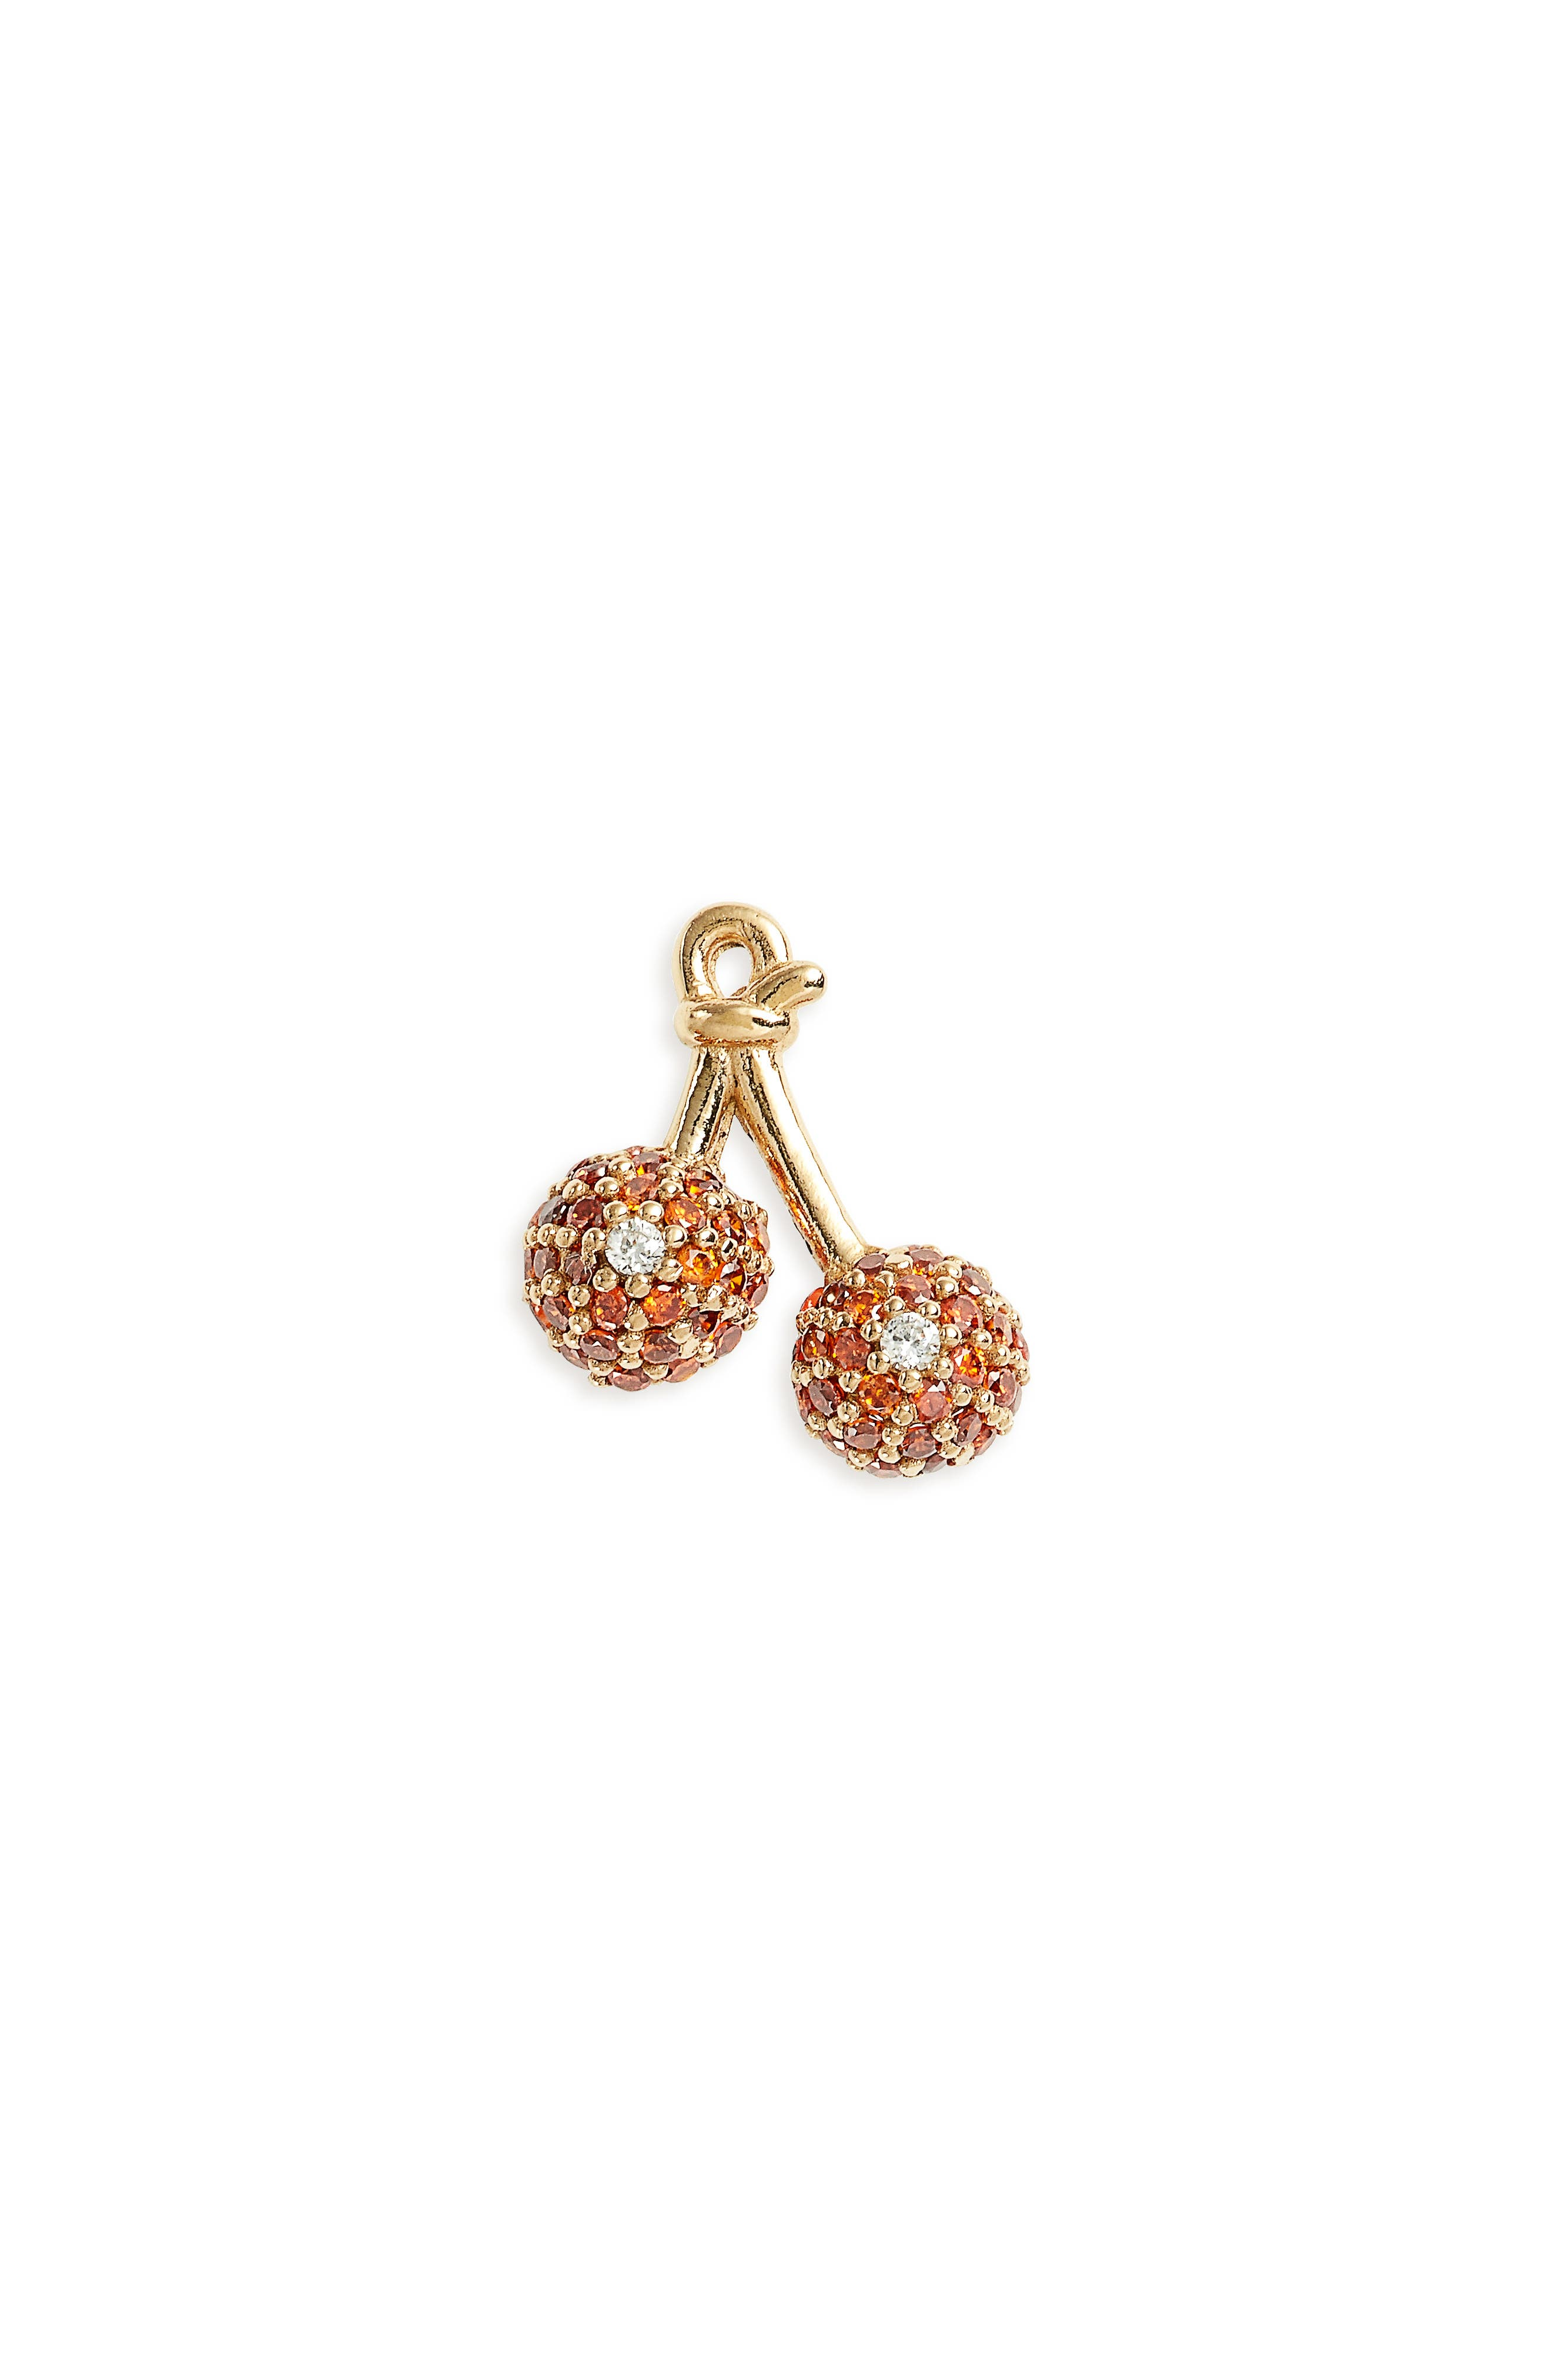 Main Image - MARC JACOBS Cherry Single Stud Earring